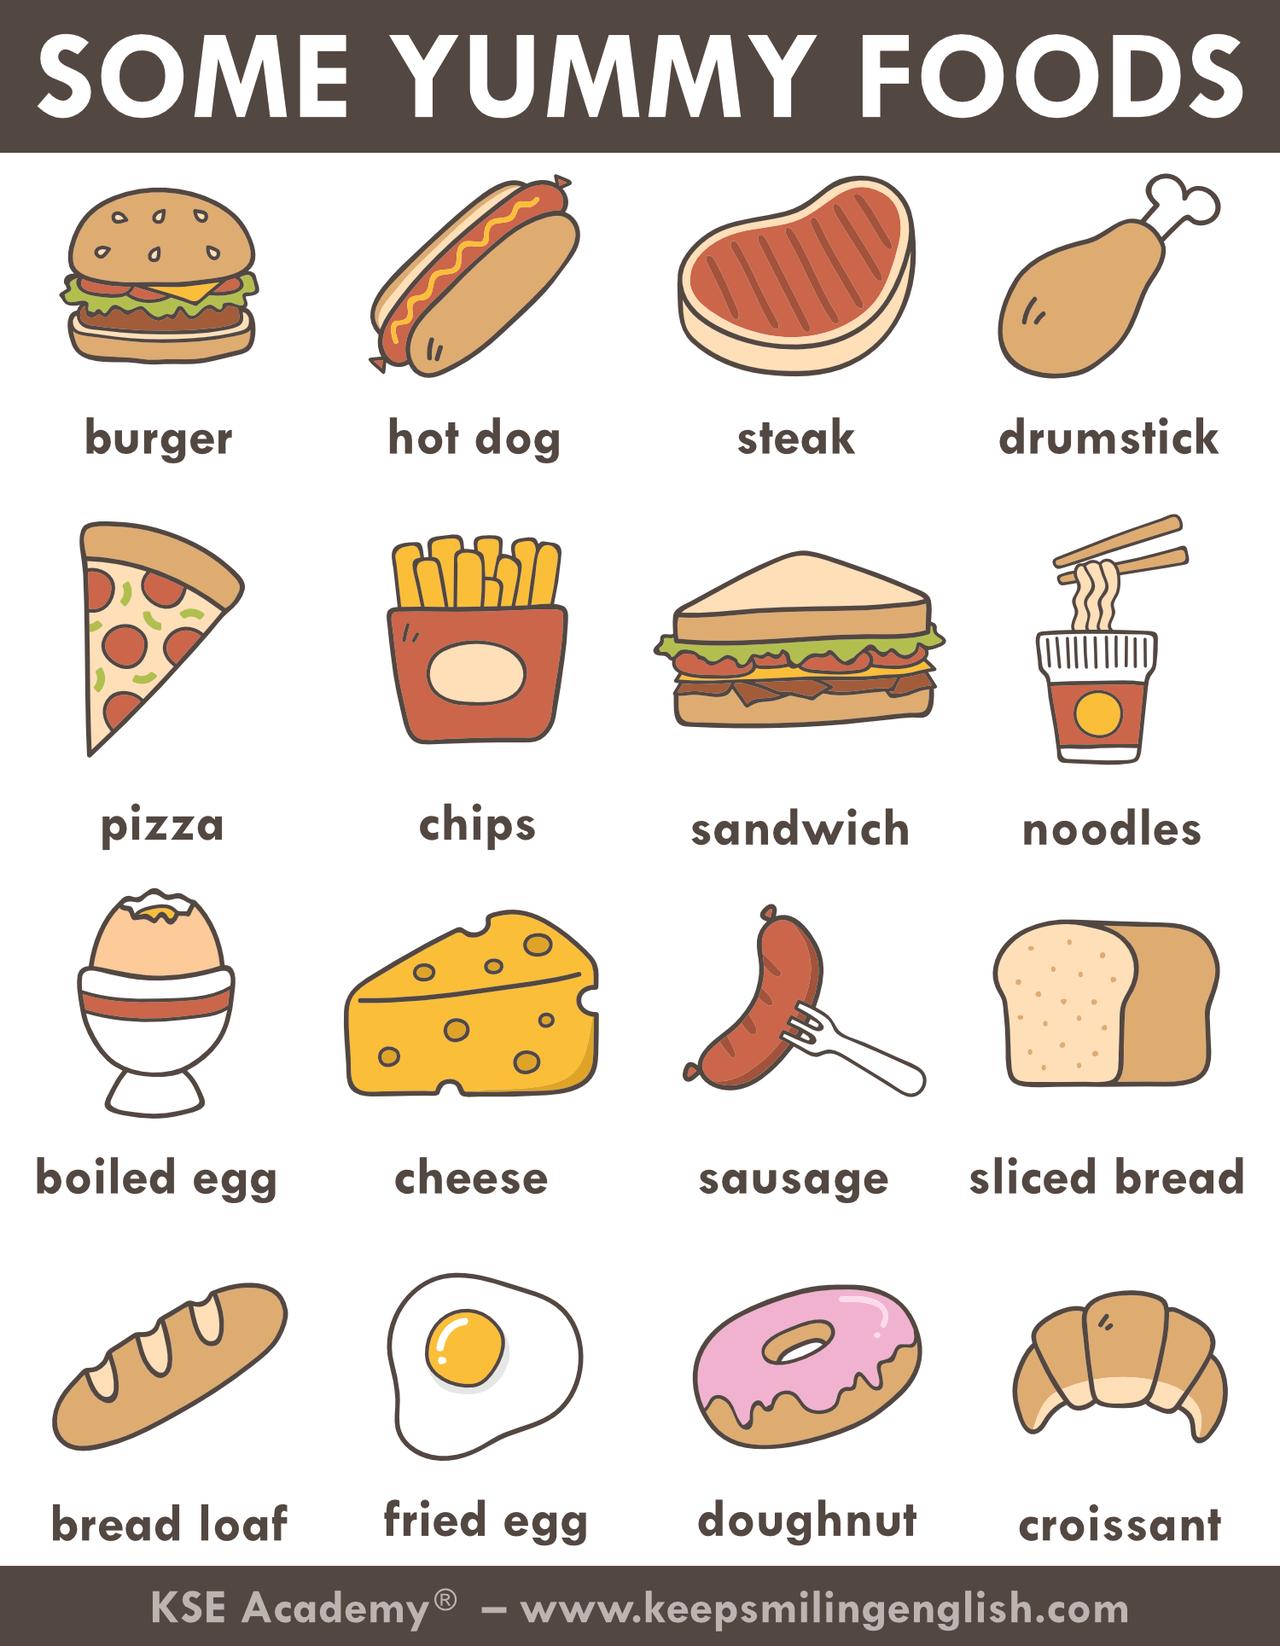 Just Some Yummy Foods Food Vocabulary Yummyfood